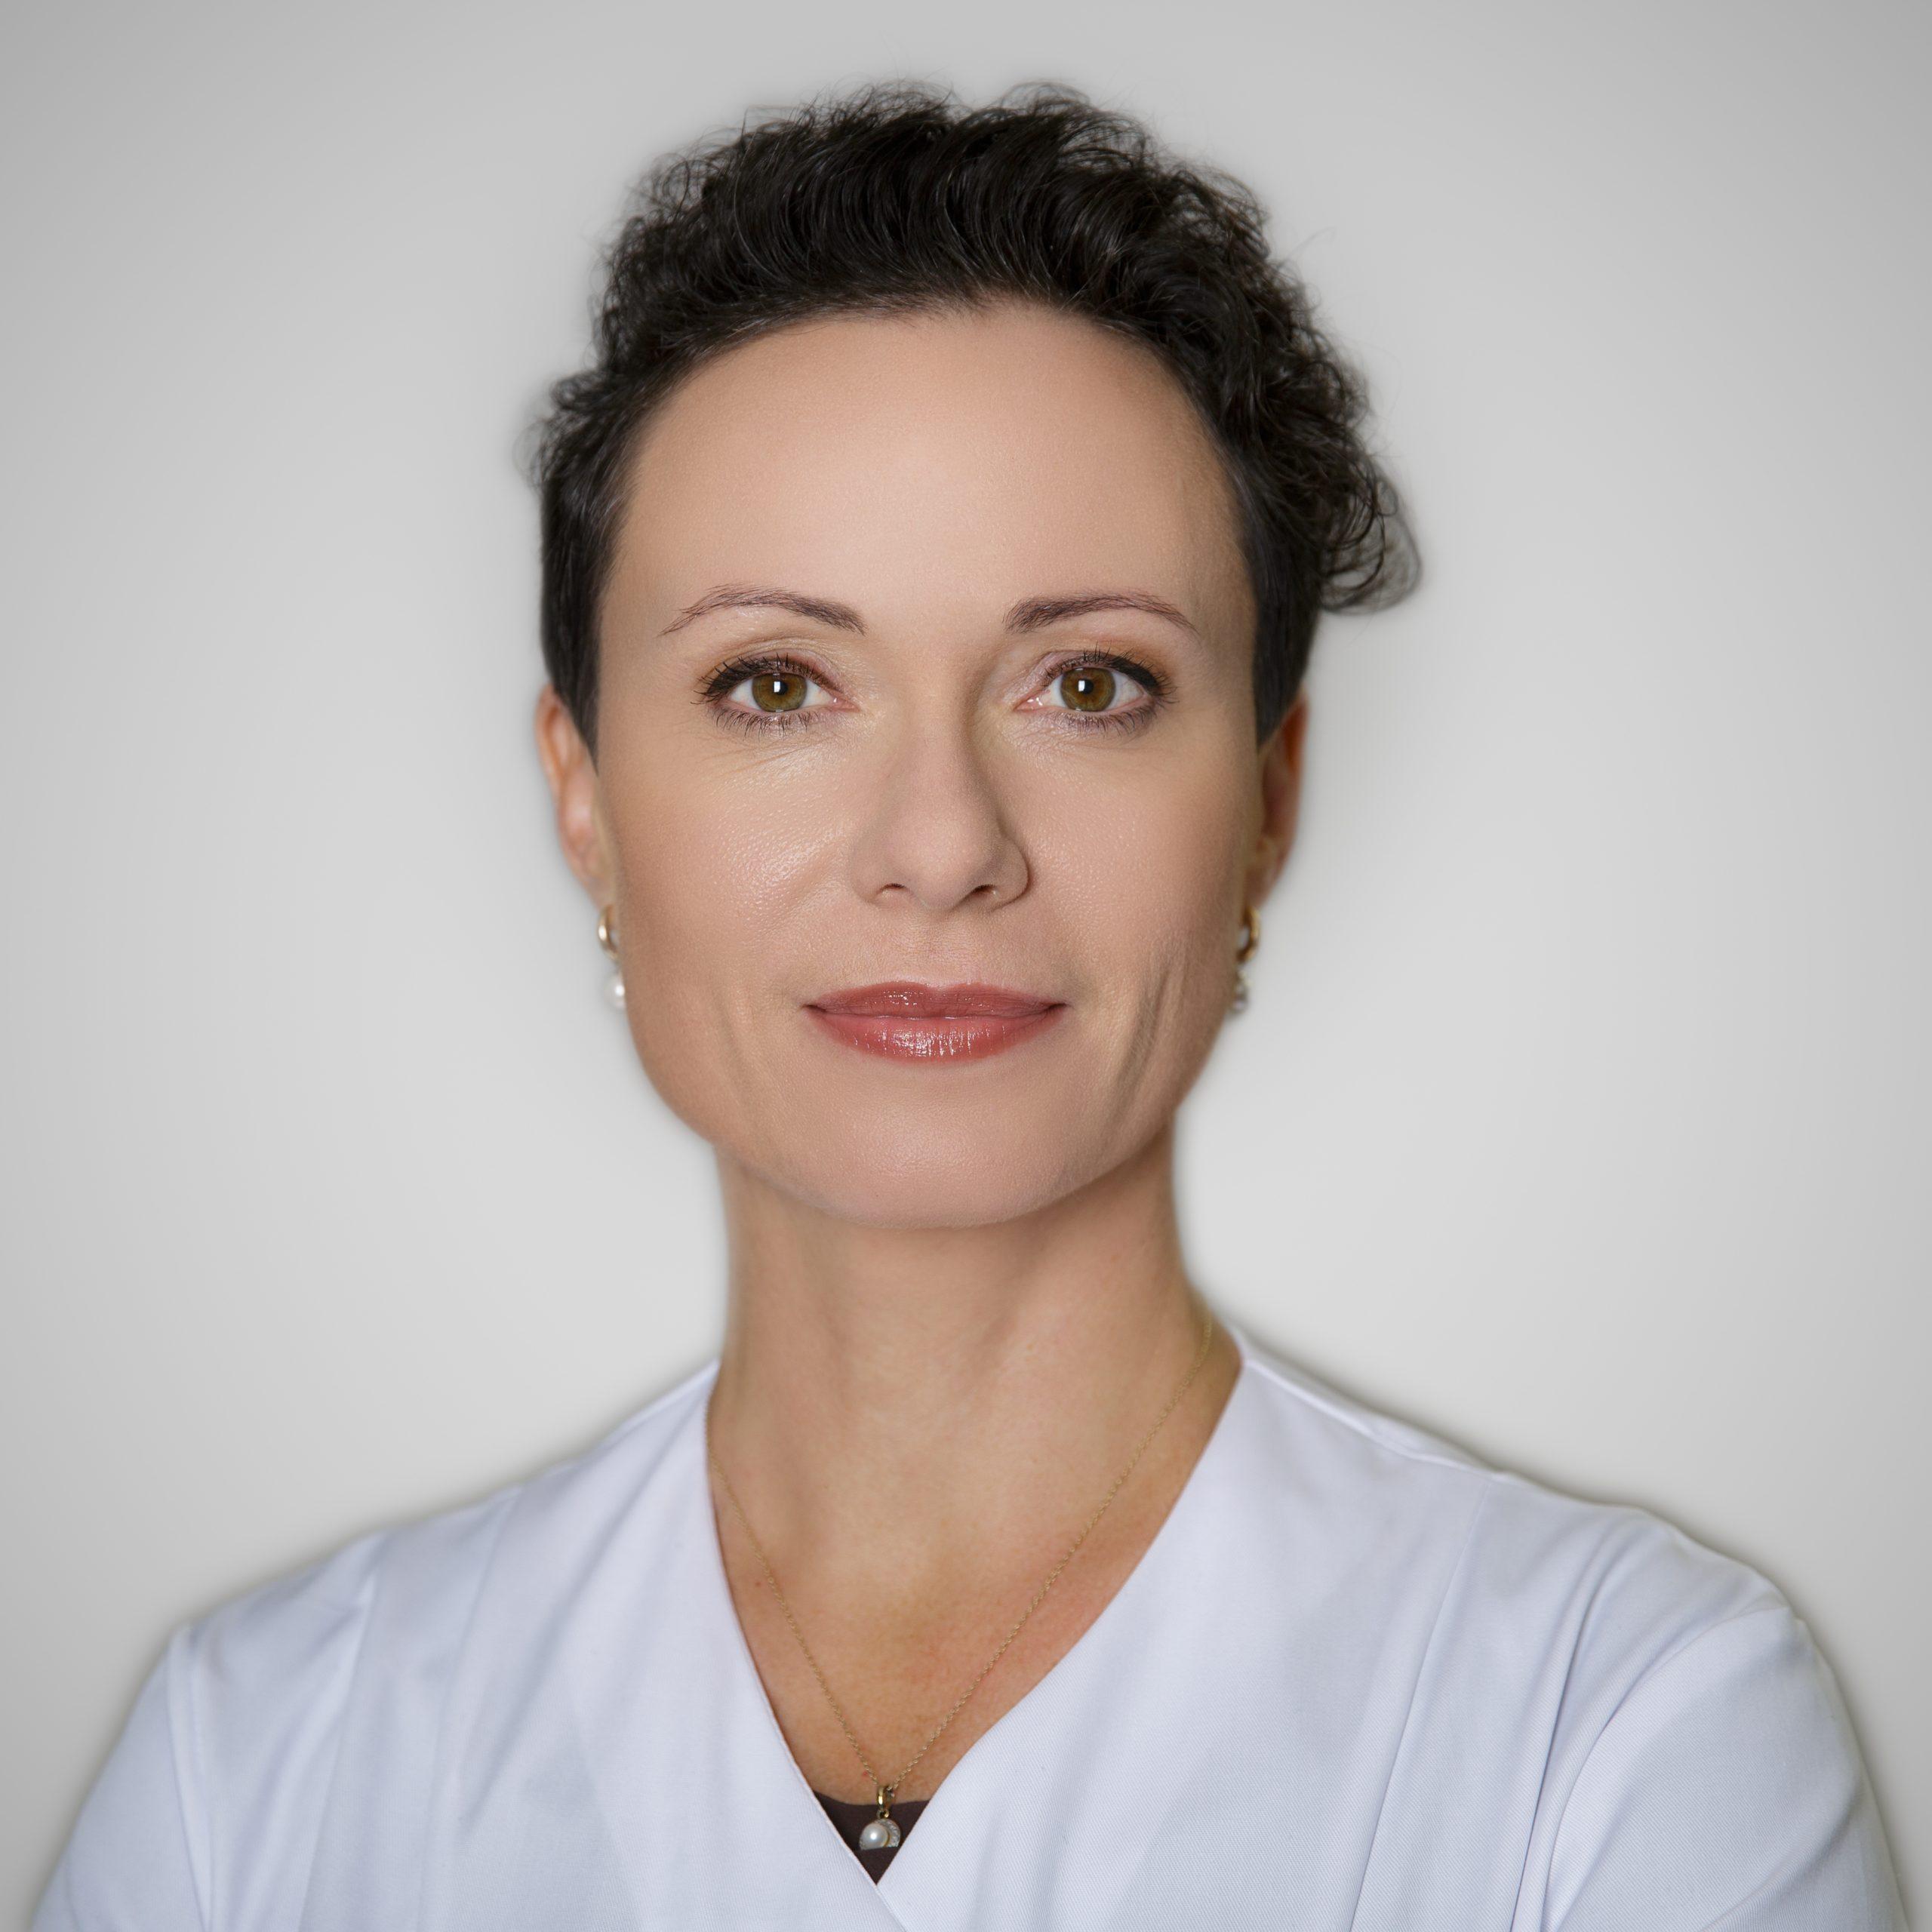 Liudmila Učkuronienė